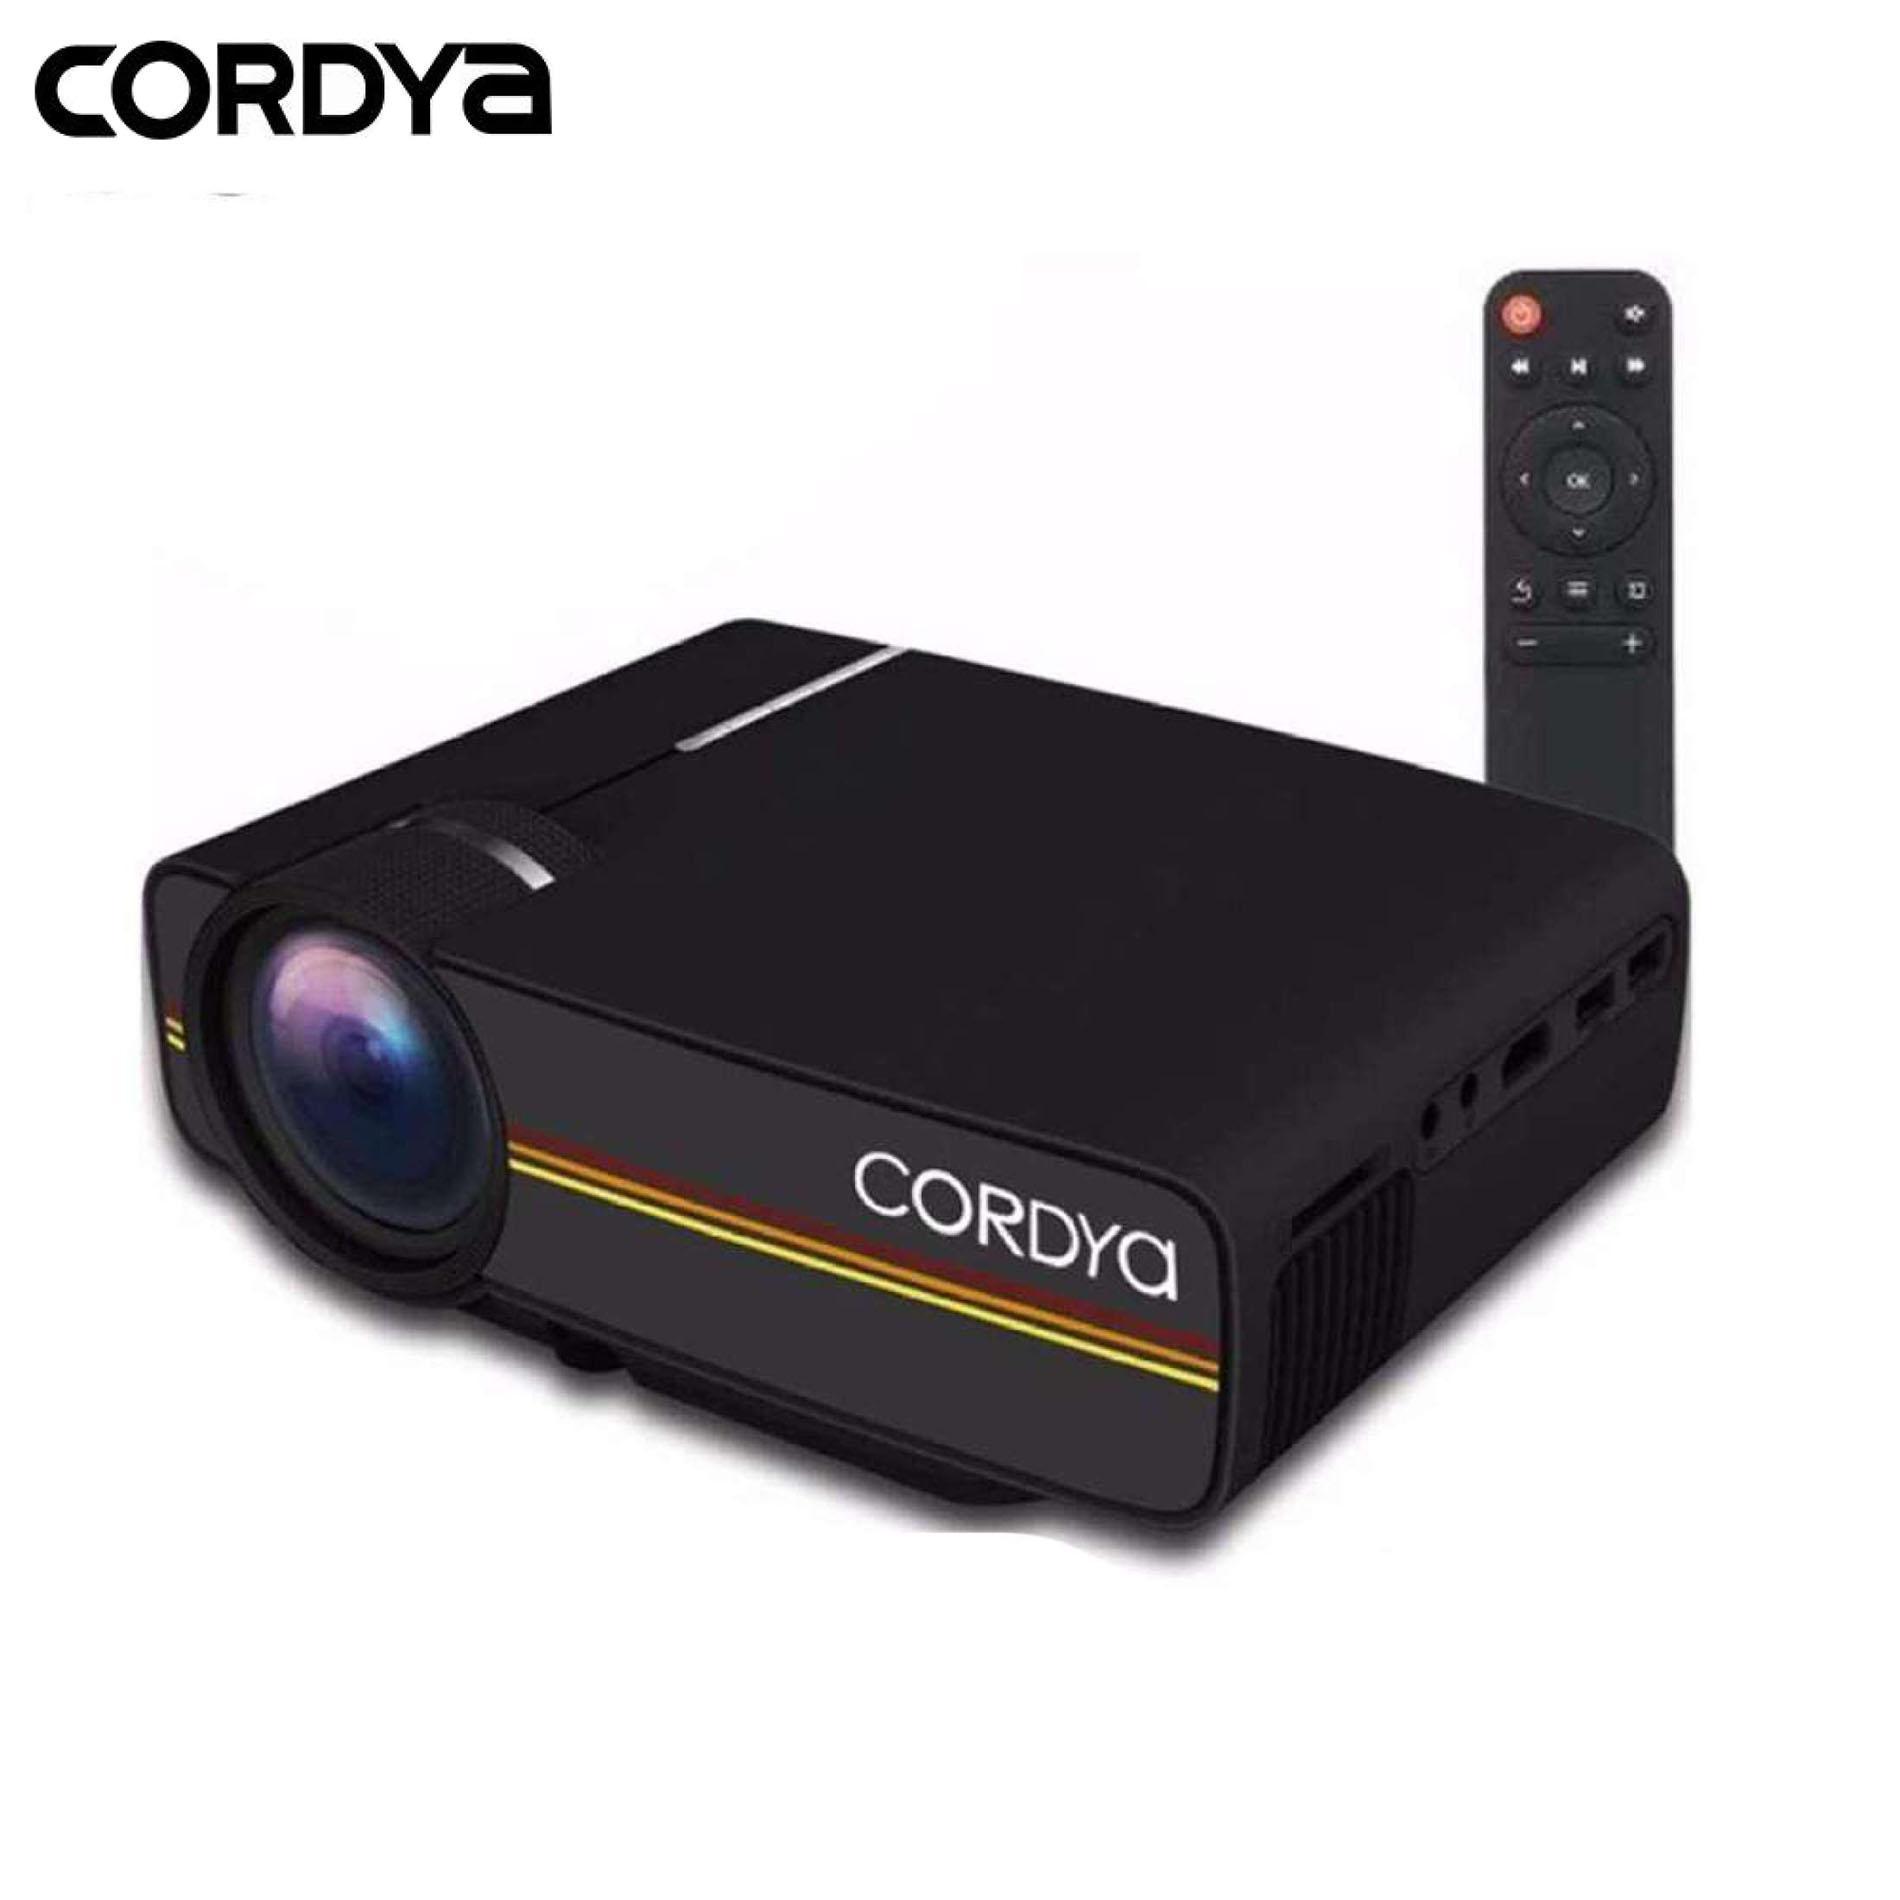 CORDYA YG 400 1080p LCD 1000 Lumens Portable Projector For Home Cinema Theater TV